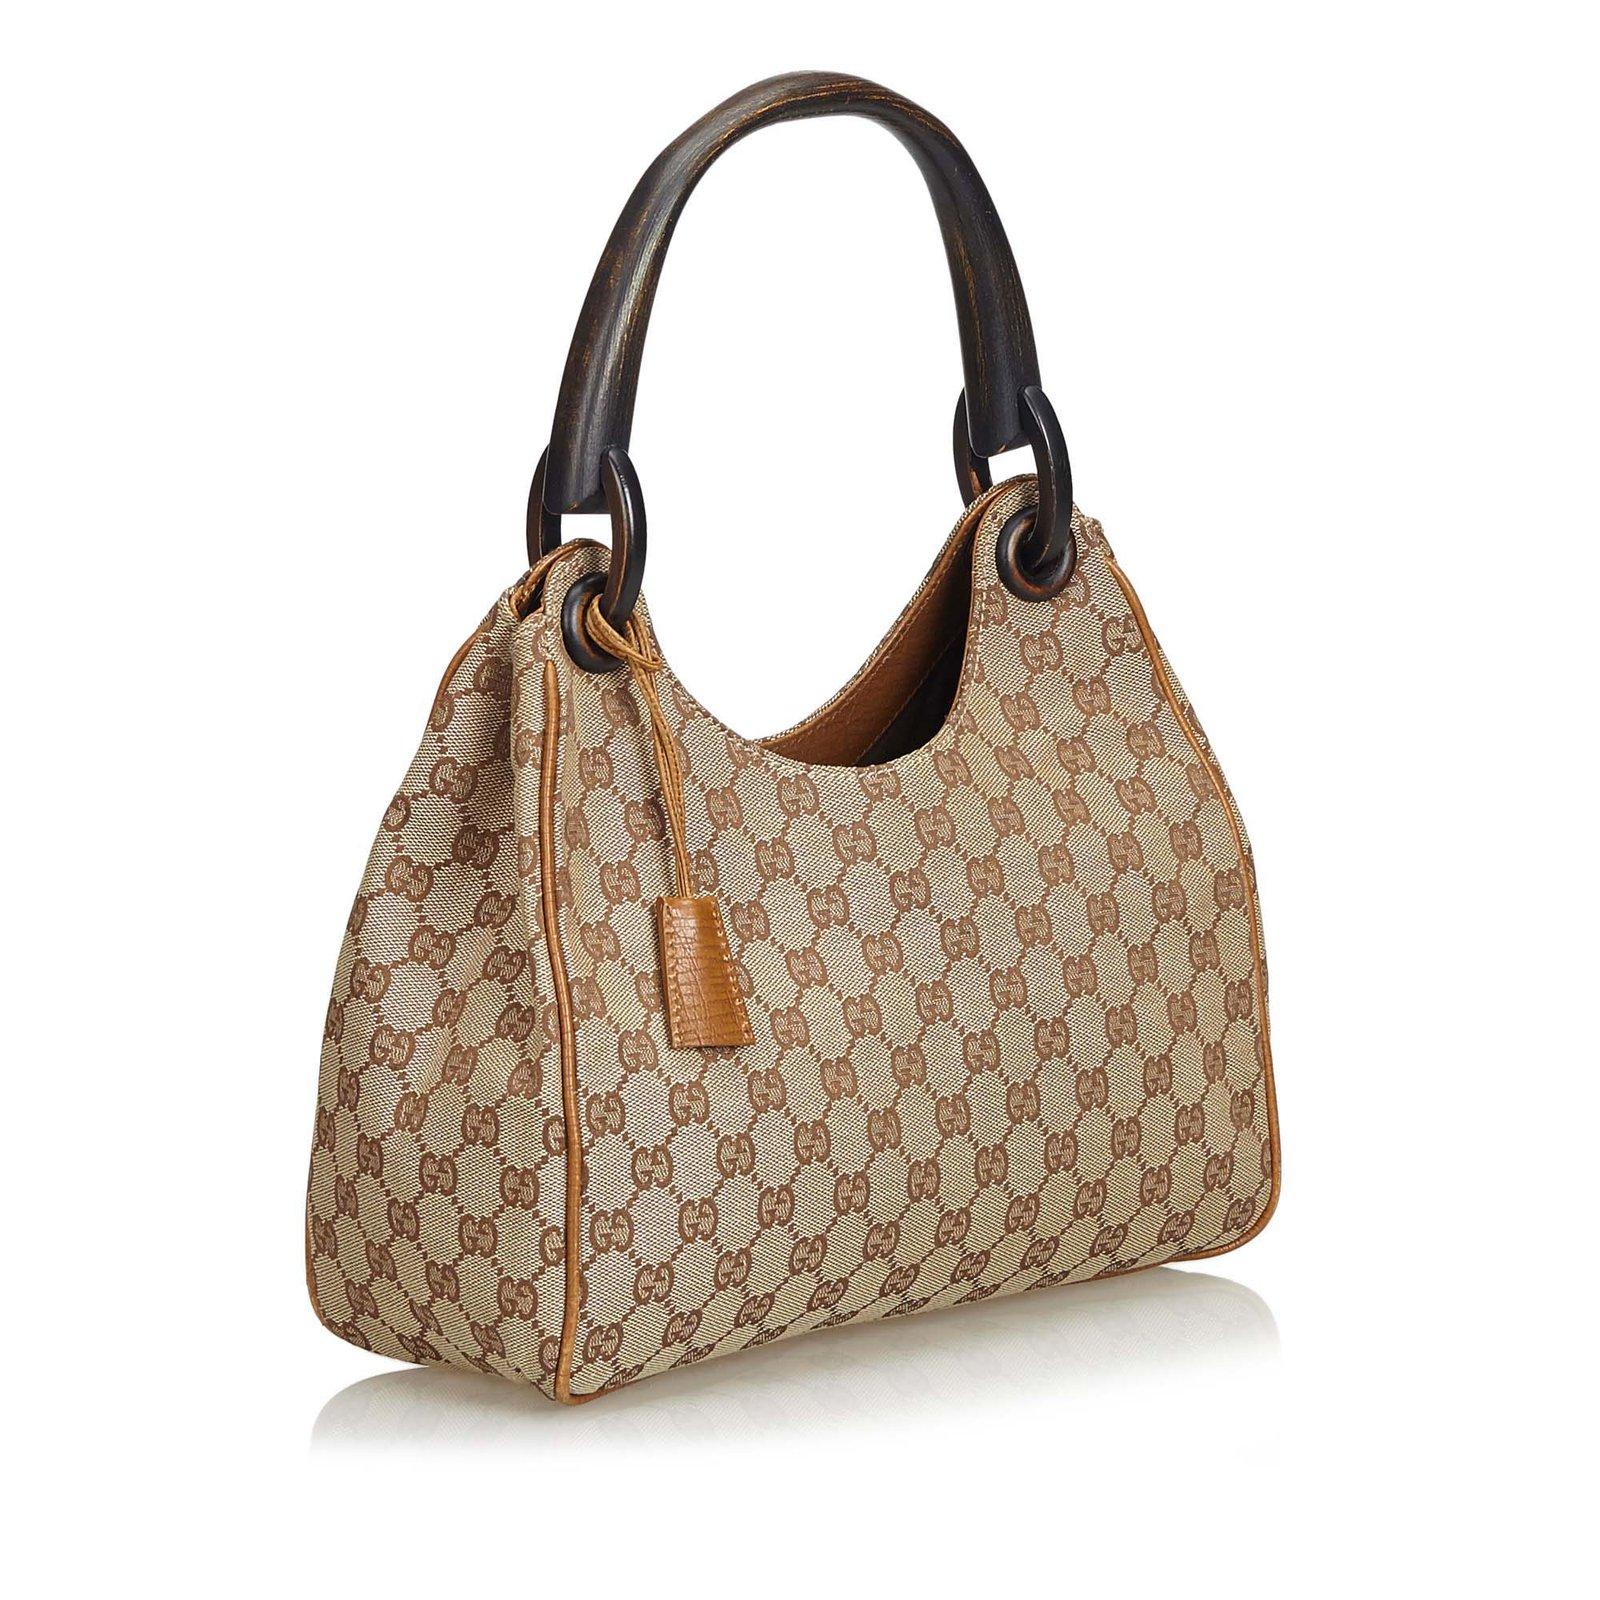 2e6c506a1e4c26 Gucci Guccissima Bamboo Canvas Handbag Handbags Leather,Other,Cloth ...